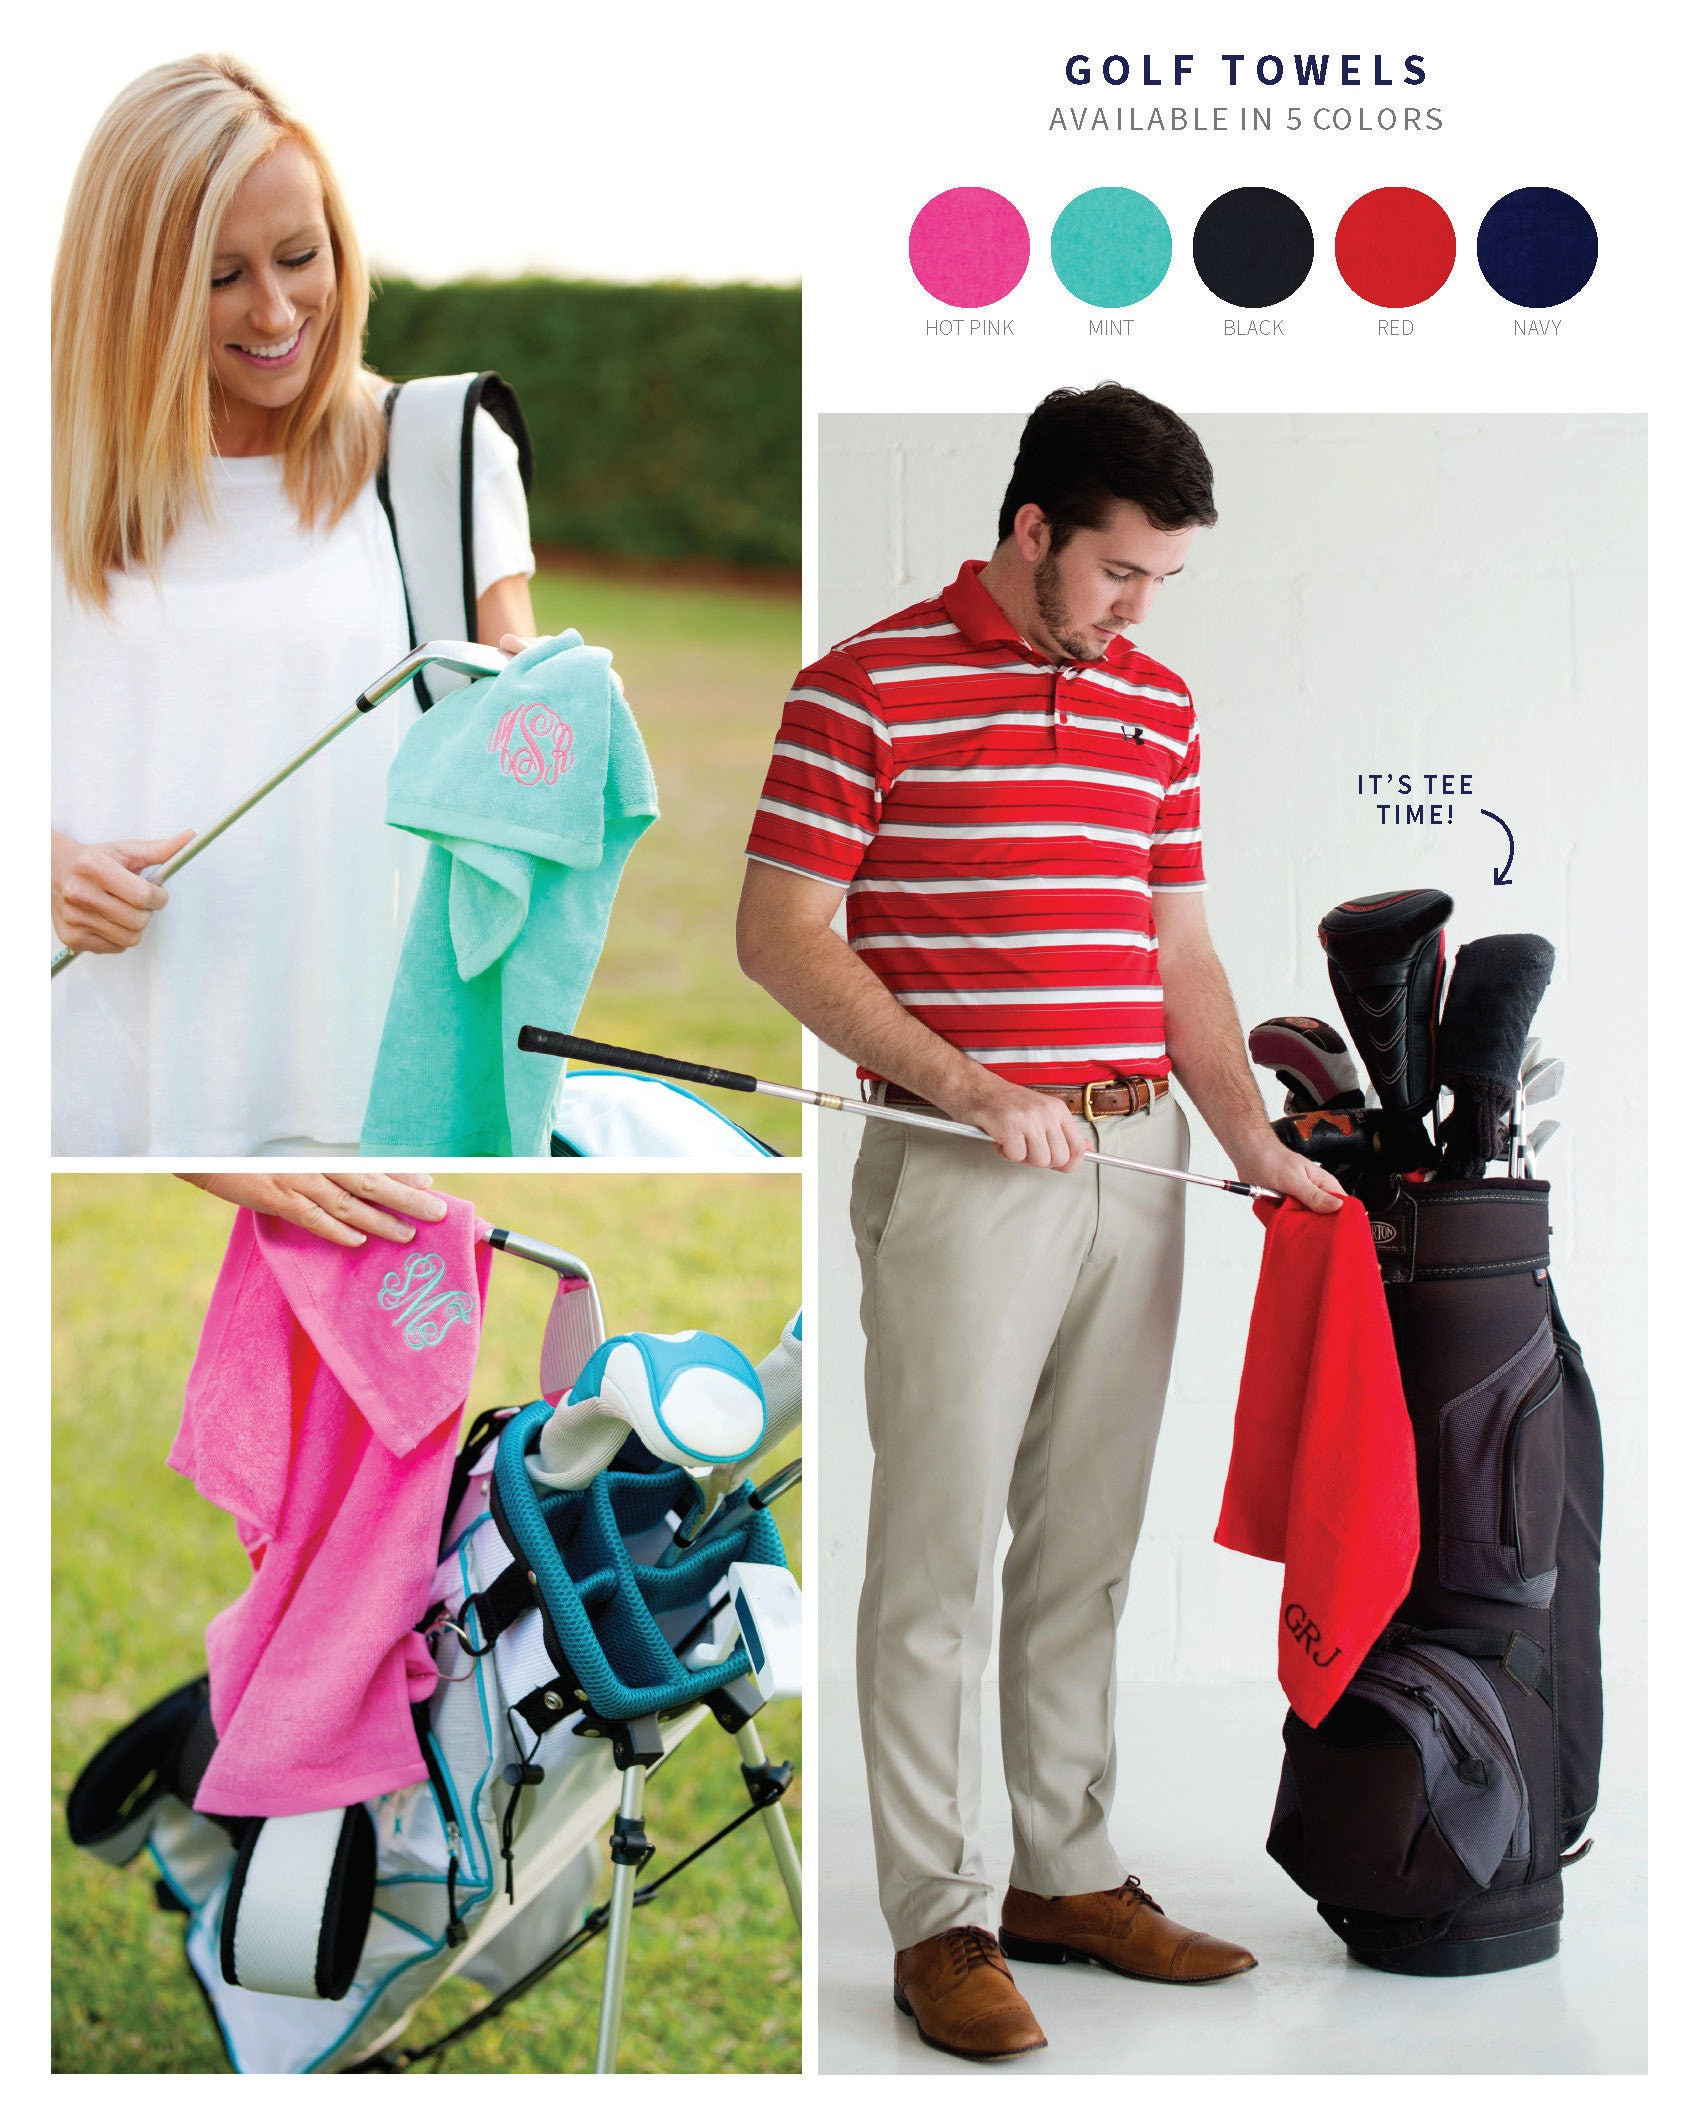 Monogram Golf Towel, Monogrammed Gifts, Monogrammed Golf